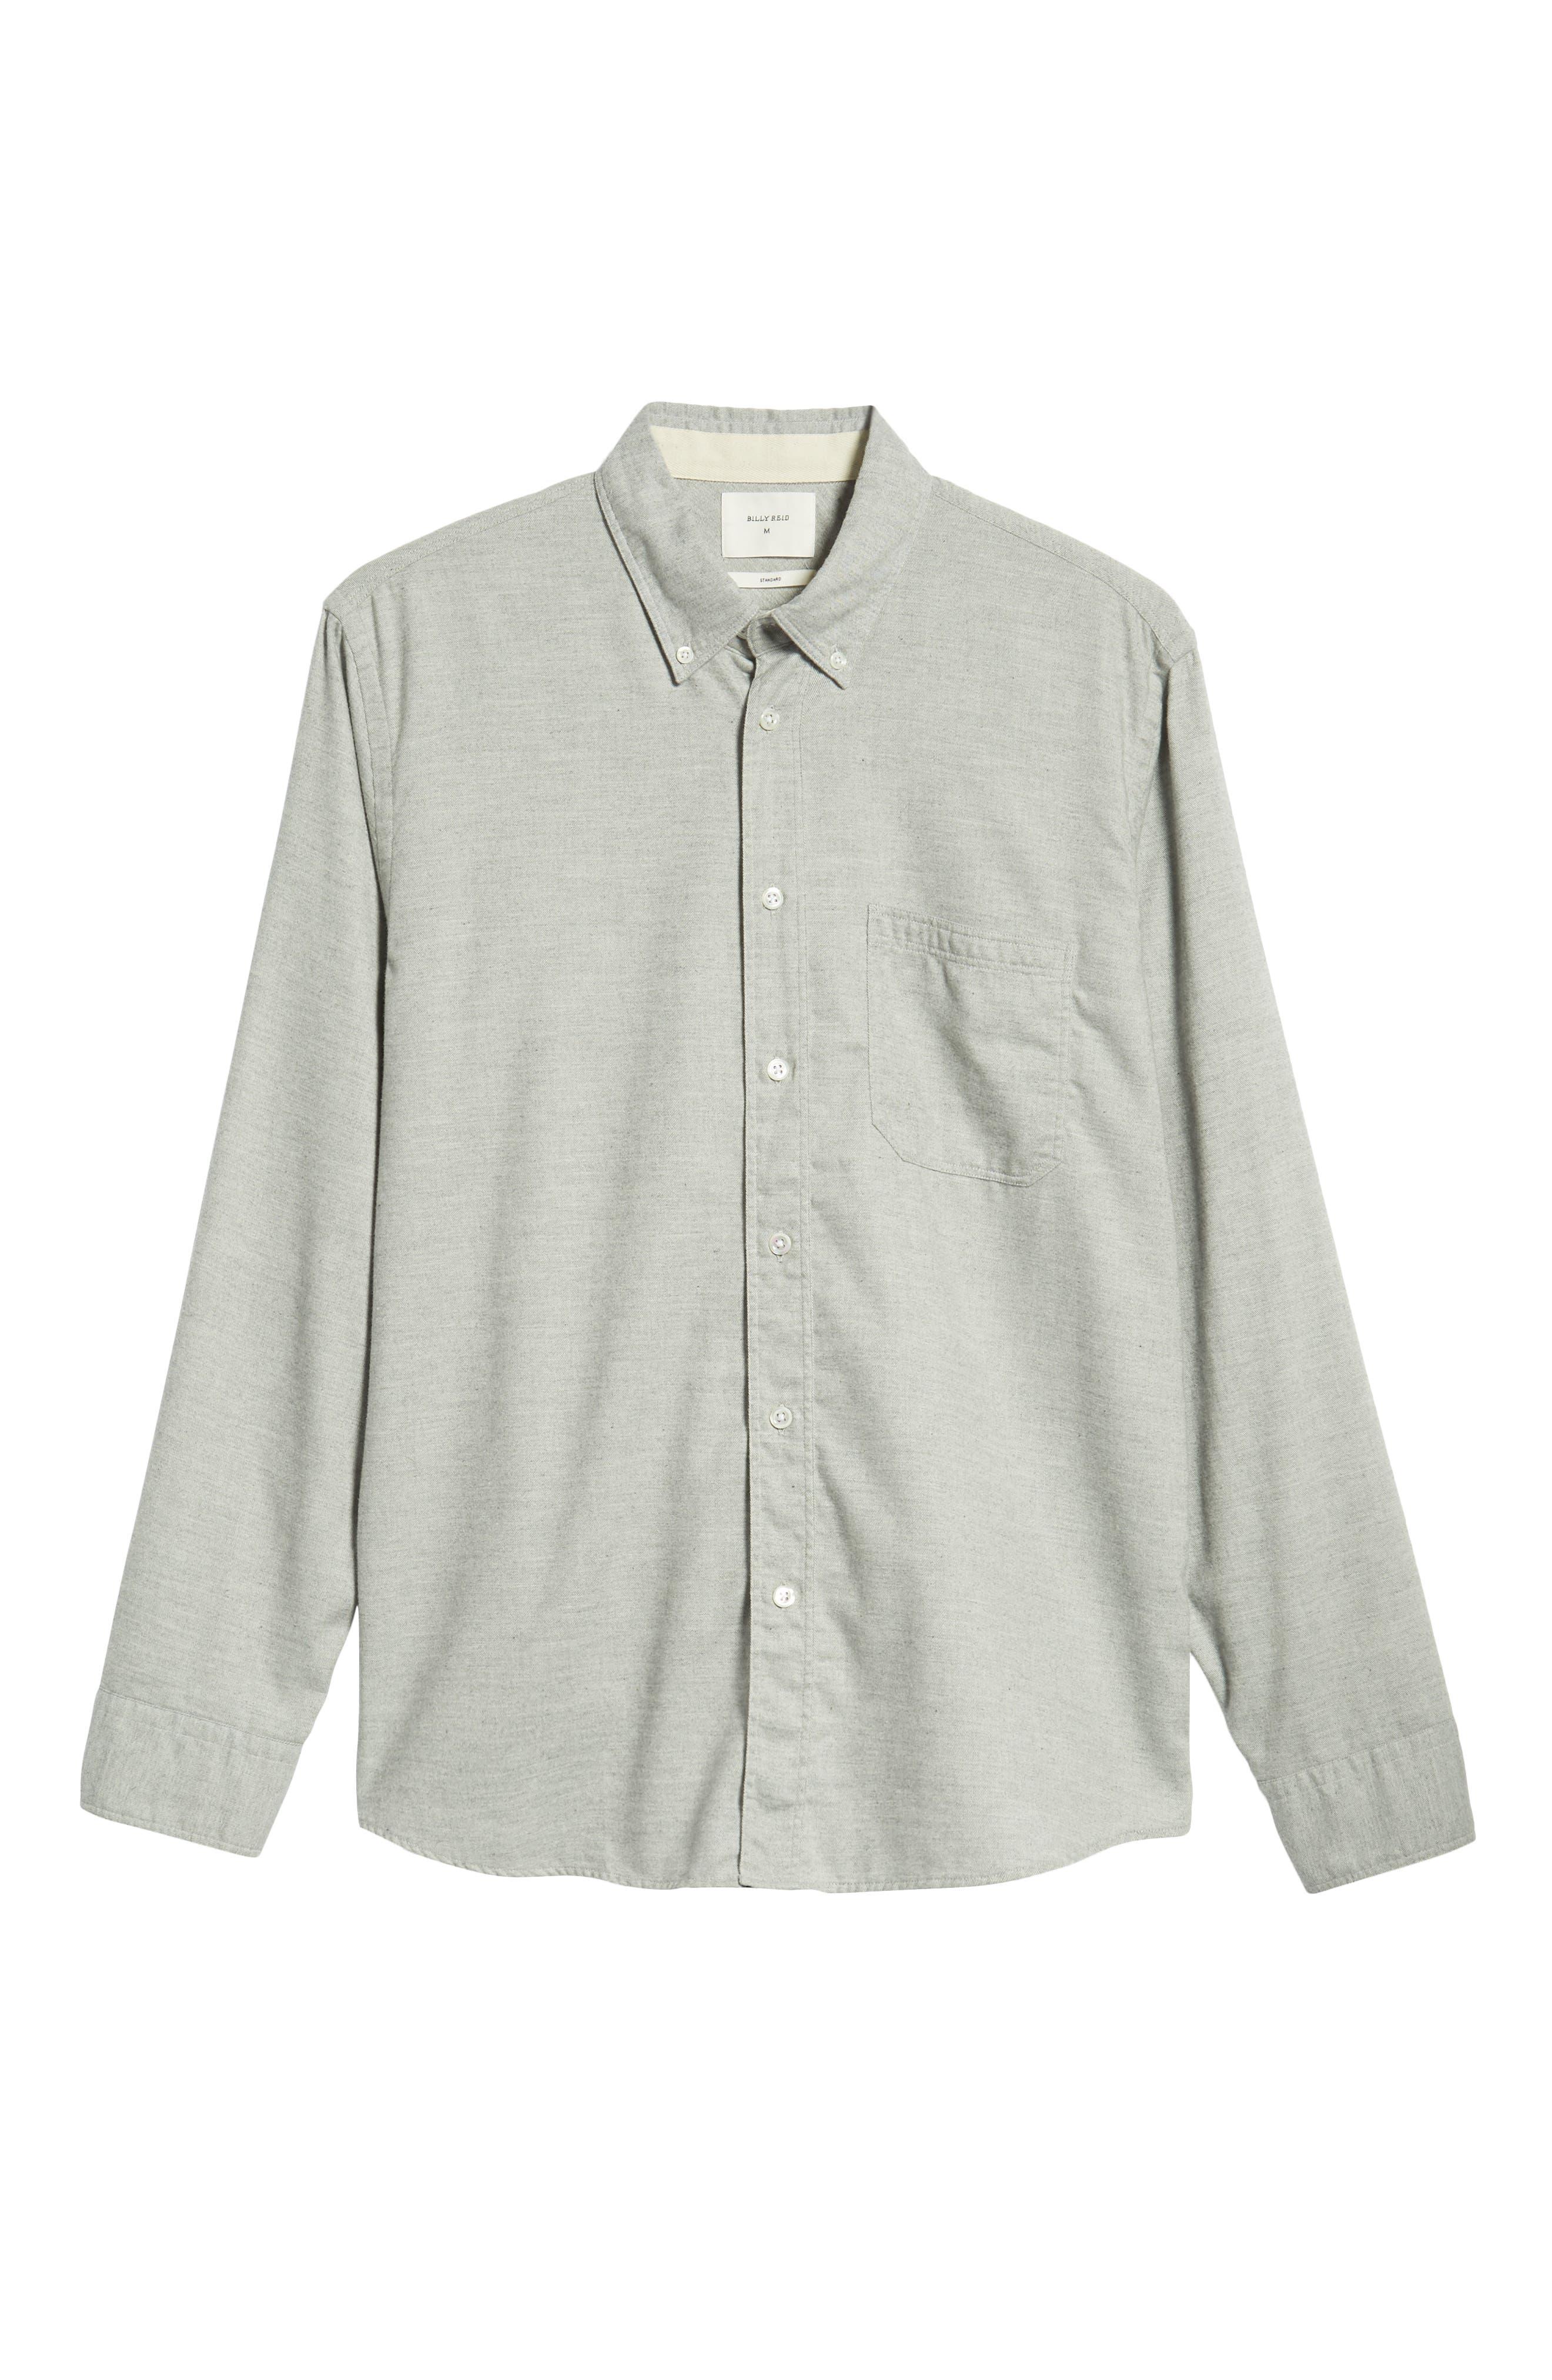 Tuscumbia Regular Fit Sport Shirt,                             Alternate thumbnail 5, color,                             LIGHT GREY